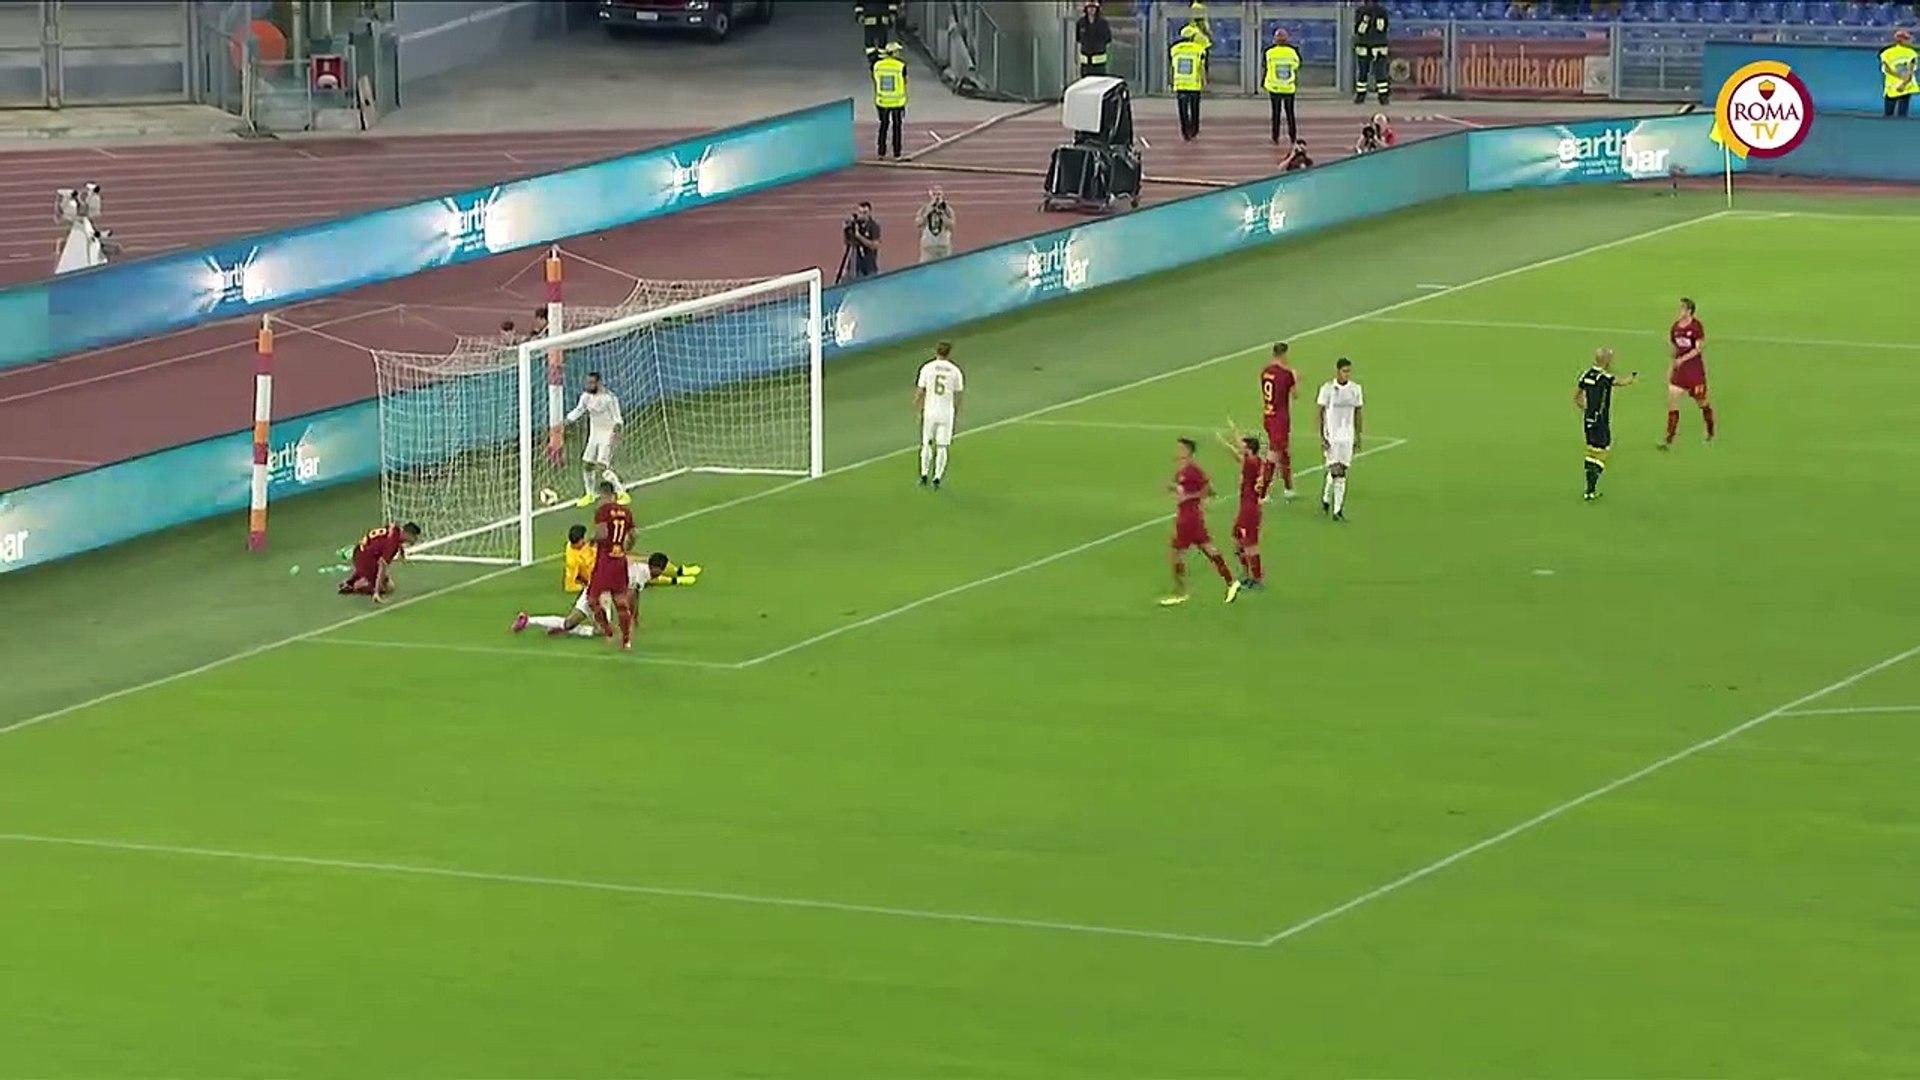 Roma VS Real Madrid 2-2 MATCH HIGHLIGHTS FRIENDLY MATCH HIGHLIGHTS 2019